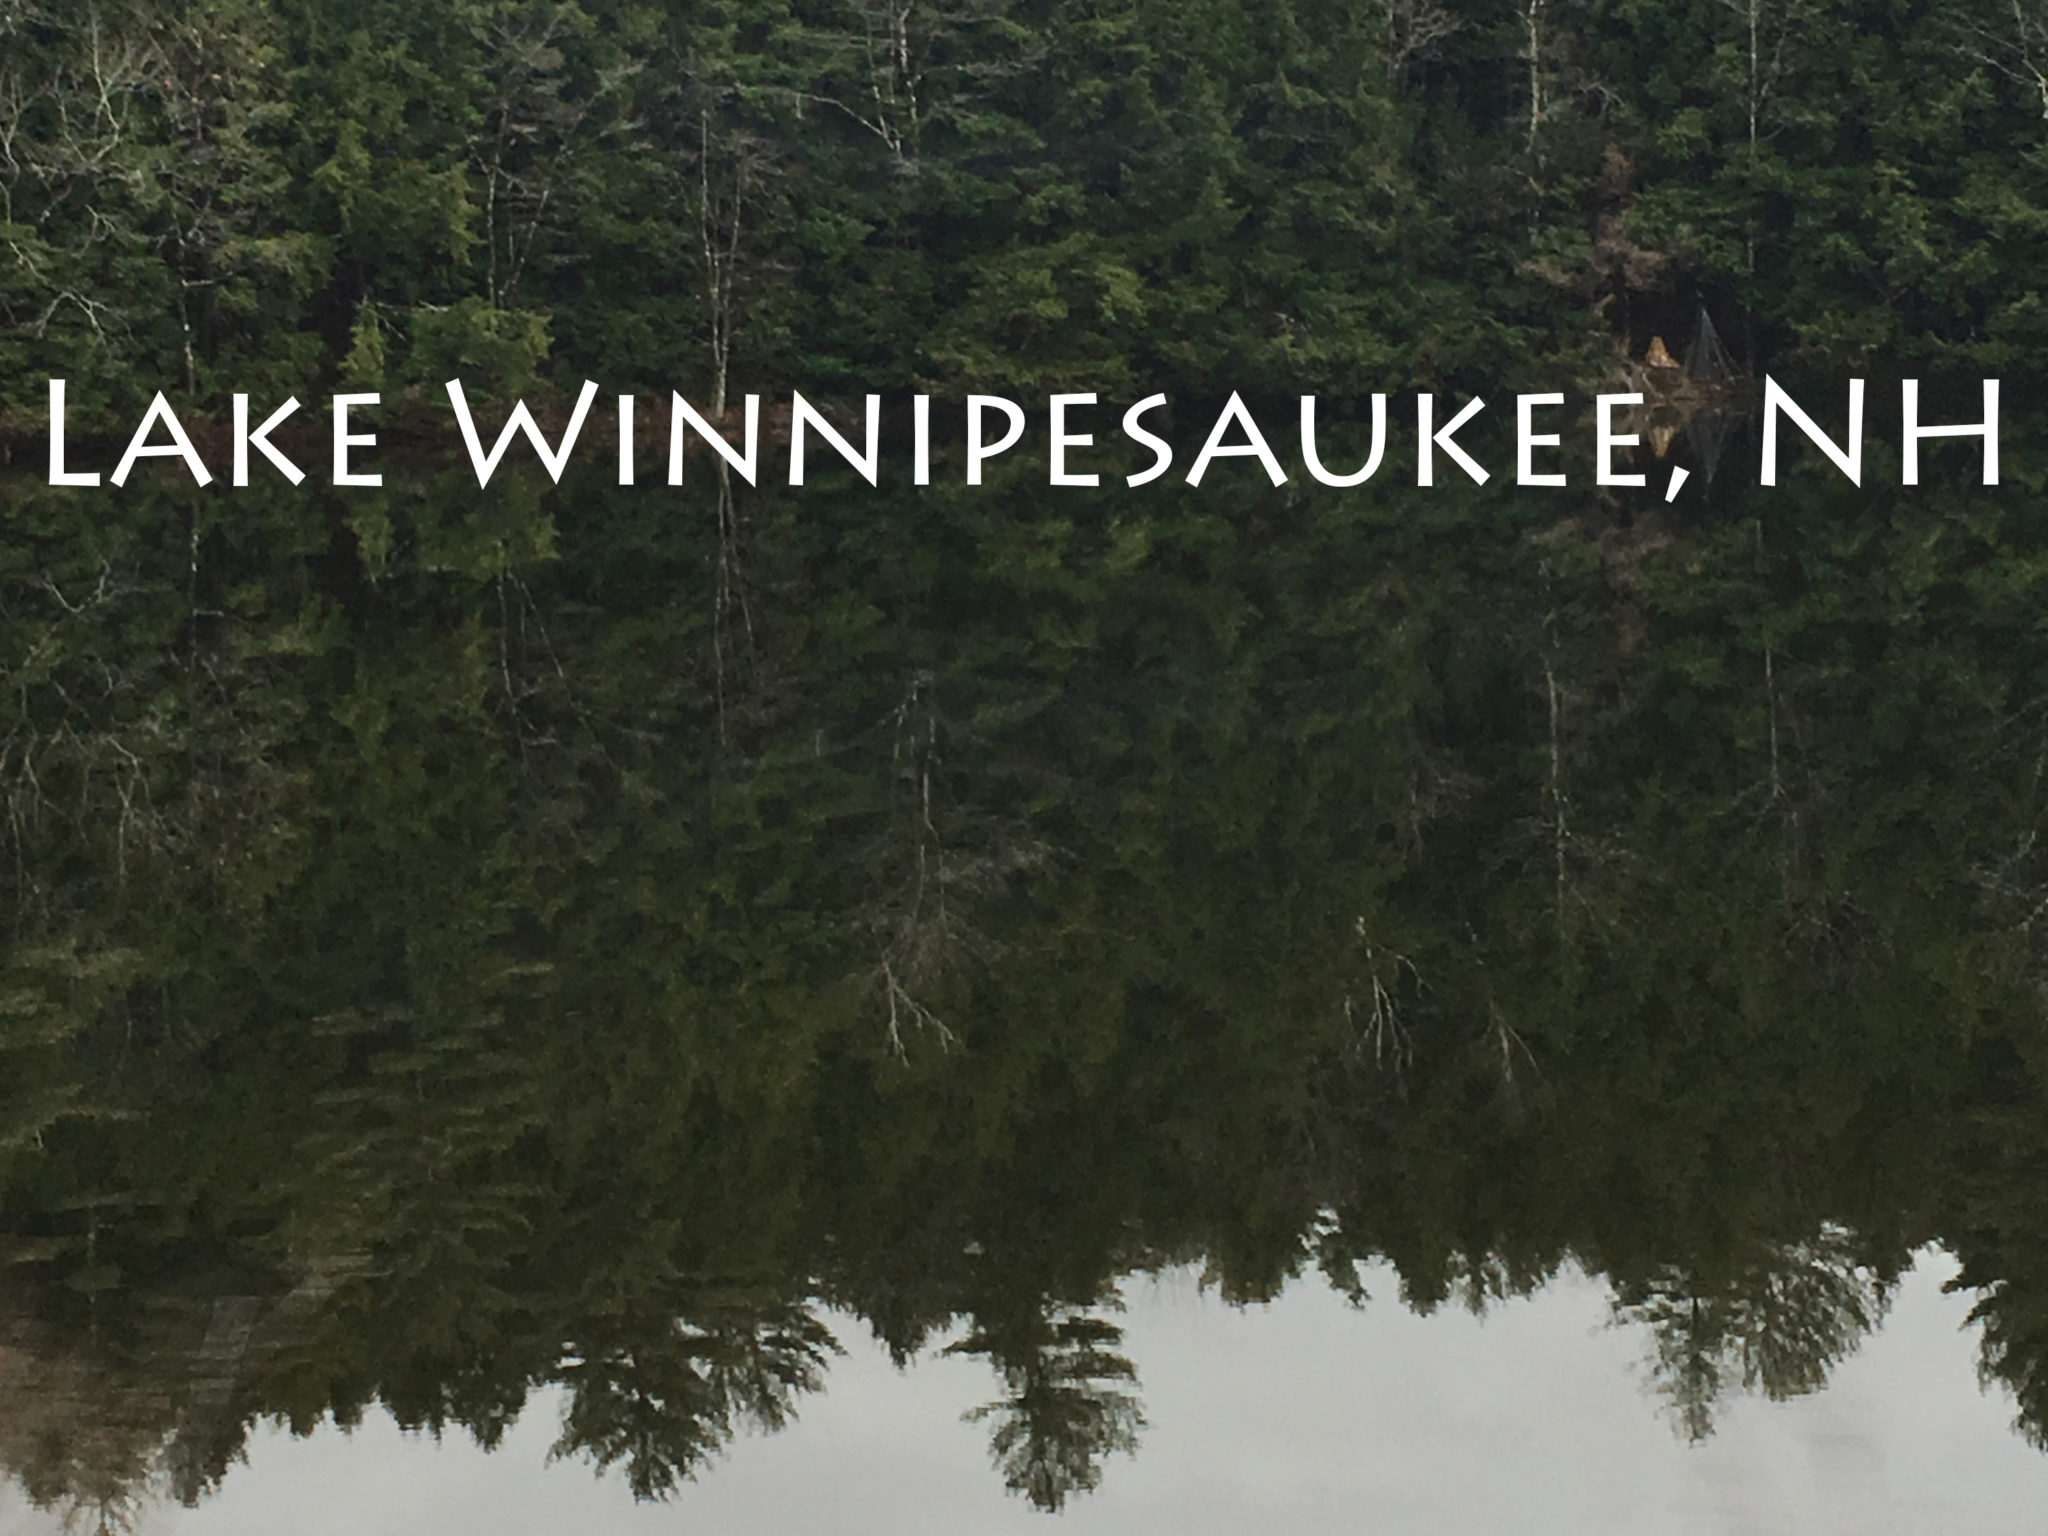 Lake Winnipesaukee in the Lakes Region of New Hampshire